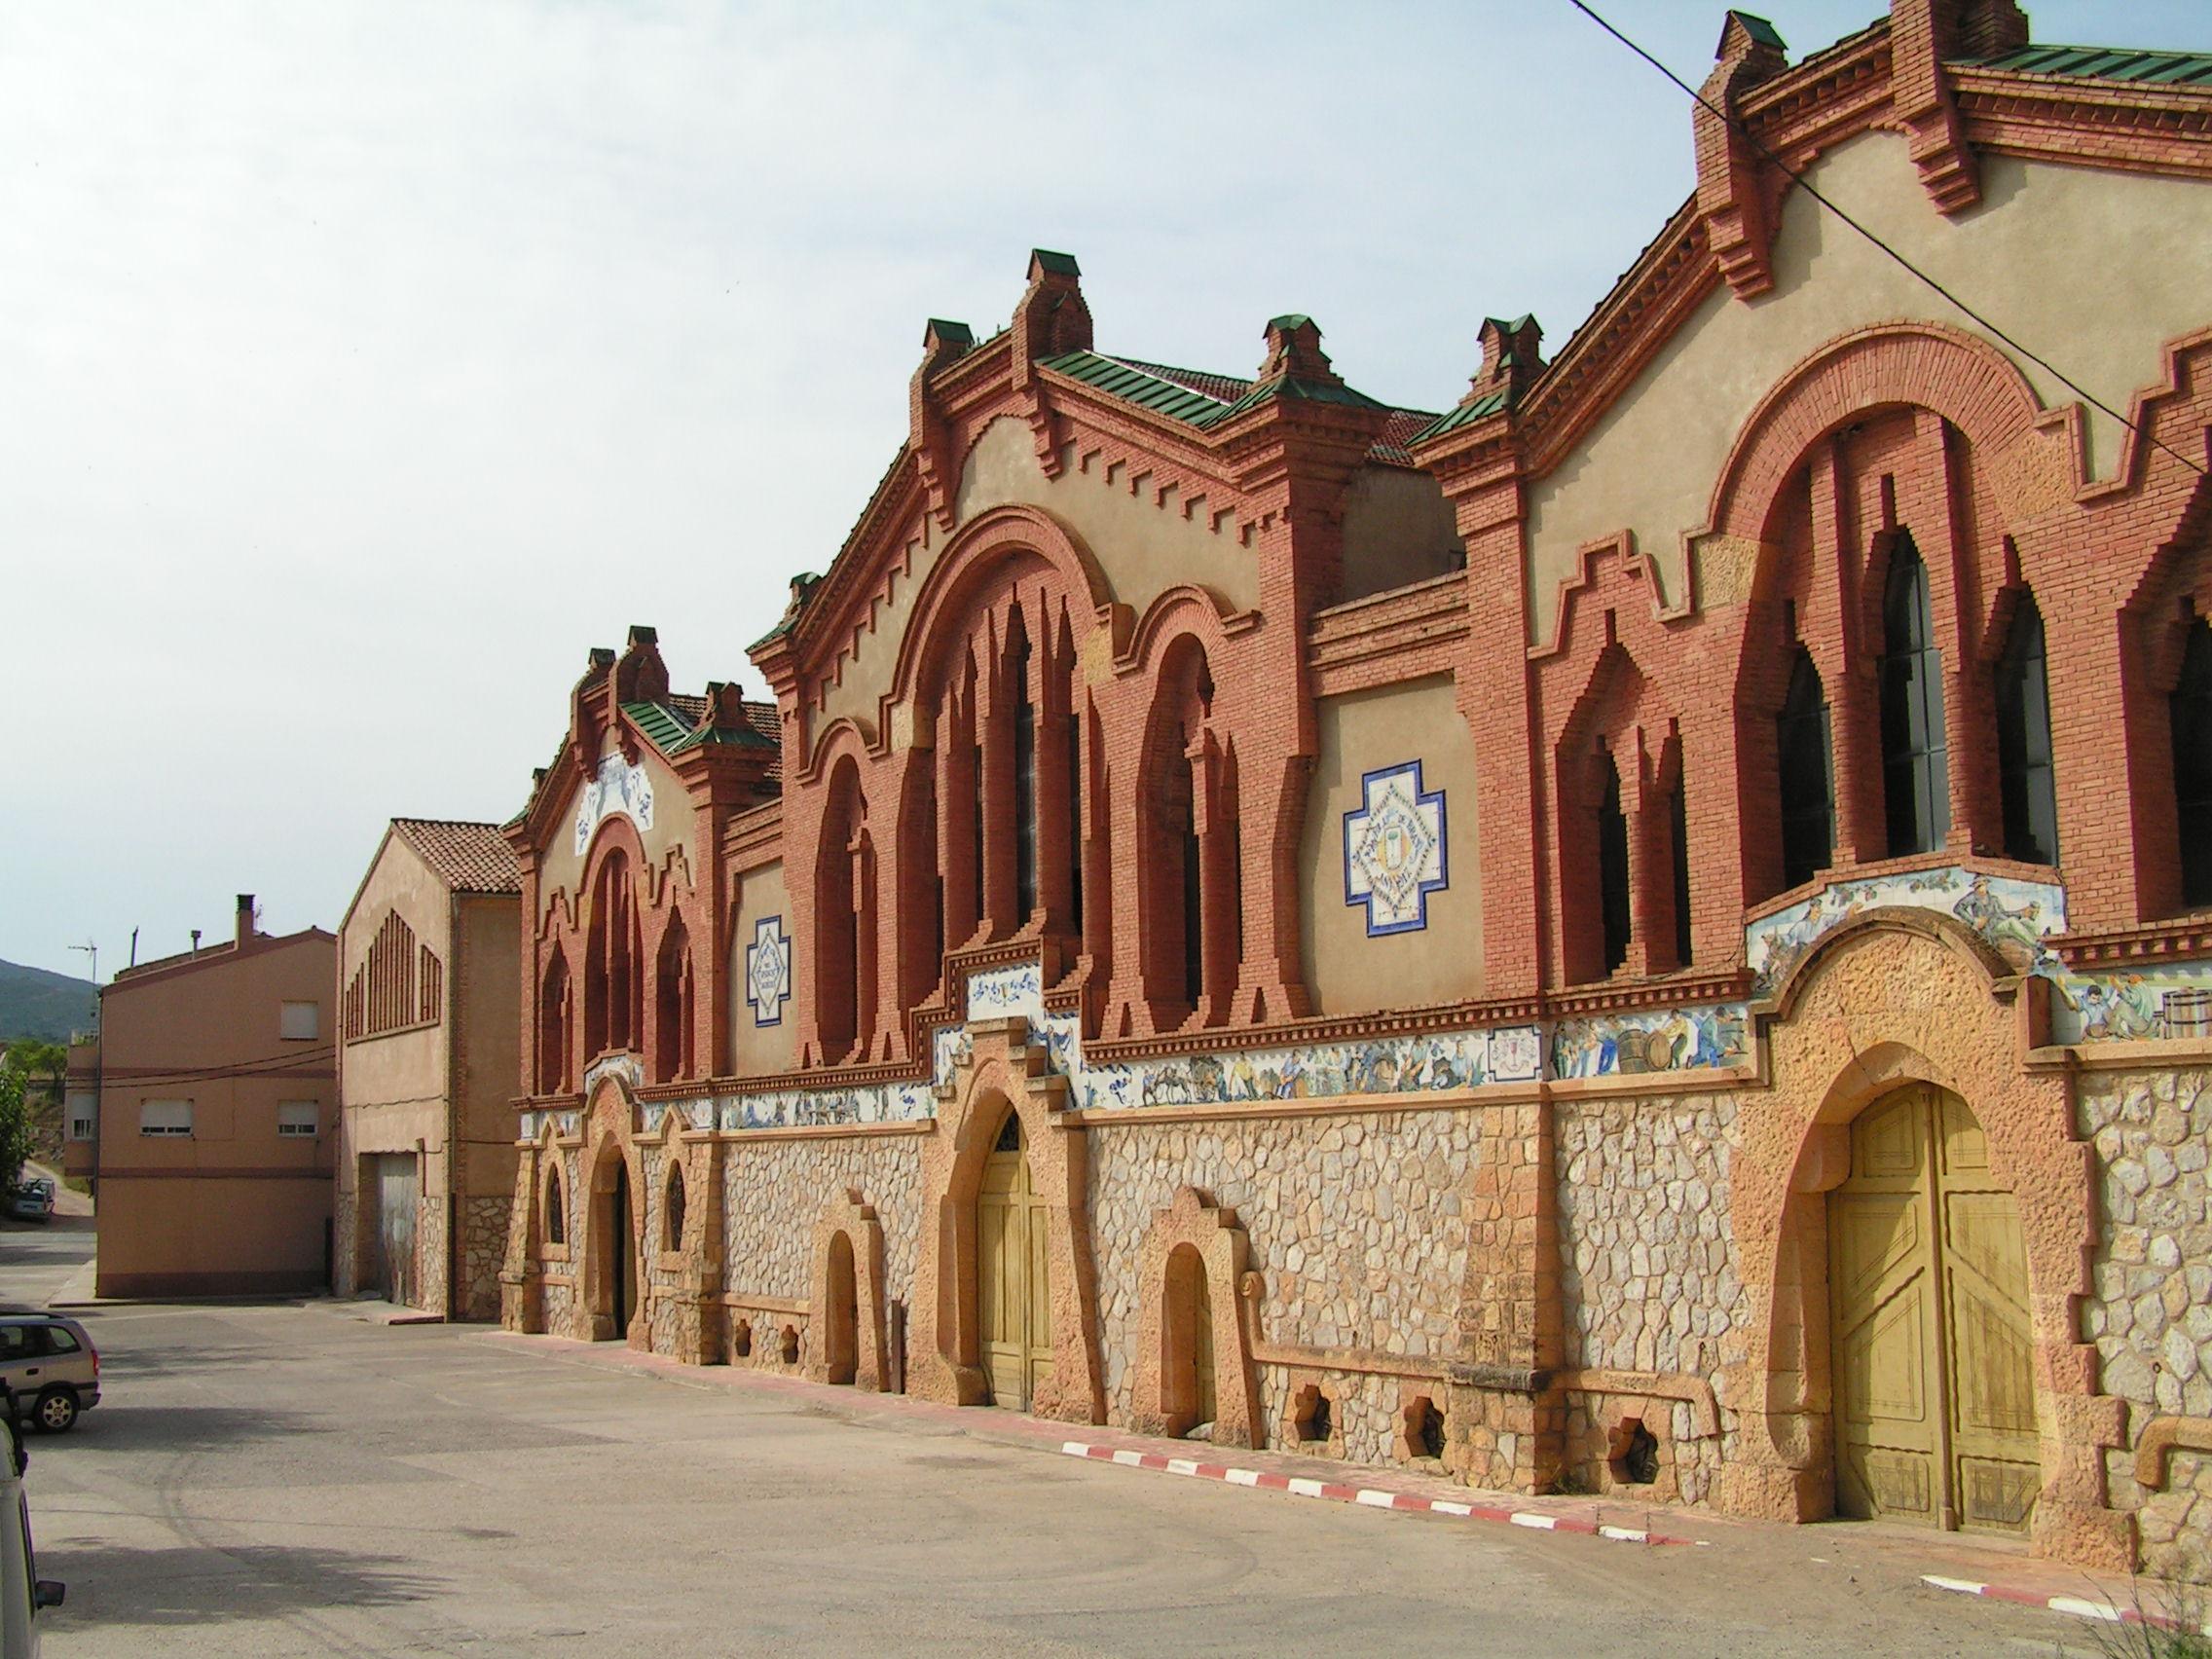 Lodi mappa google des photos des photos de fond fond d 233 cran